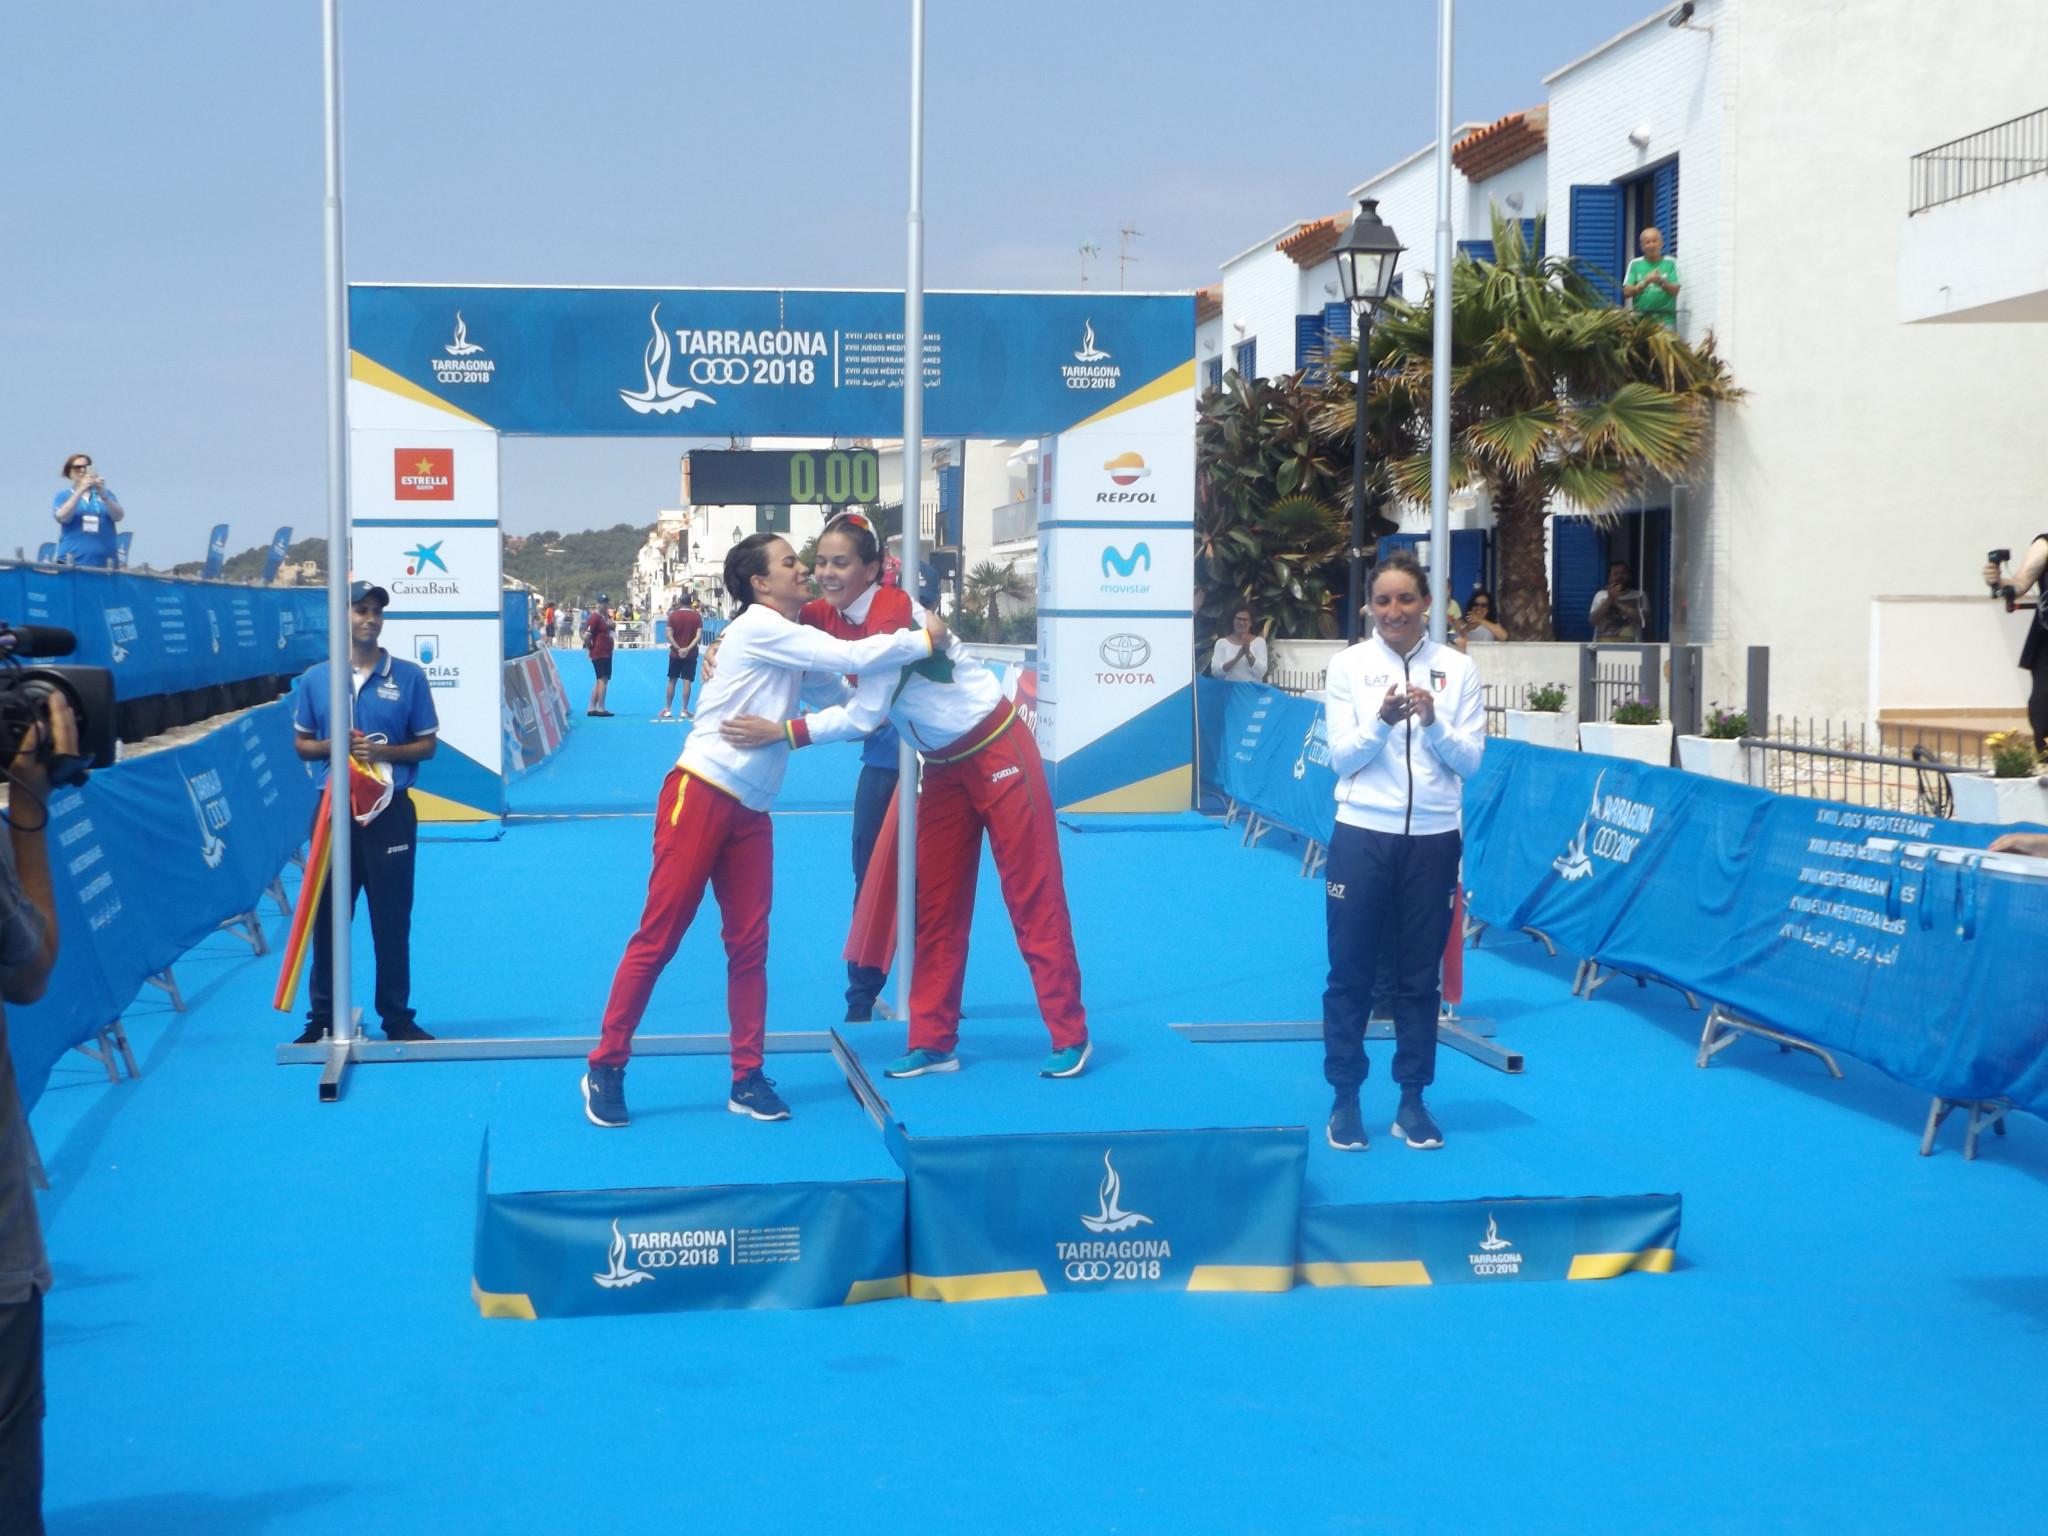 Portugal win first gold medals of Mediterranean Games in triathlon